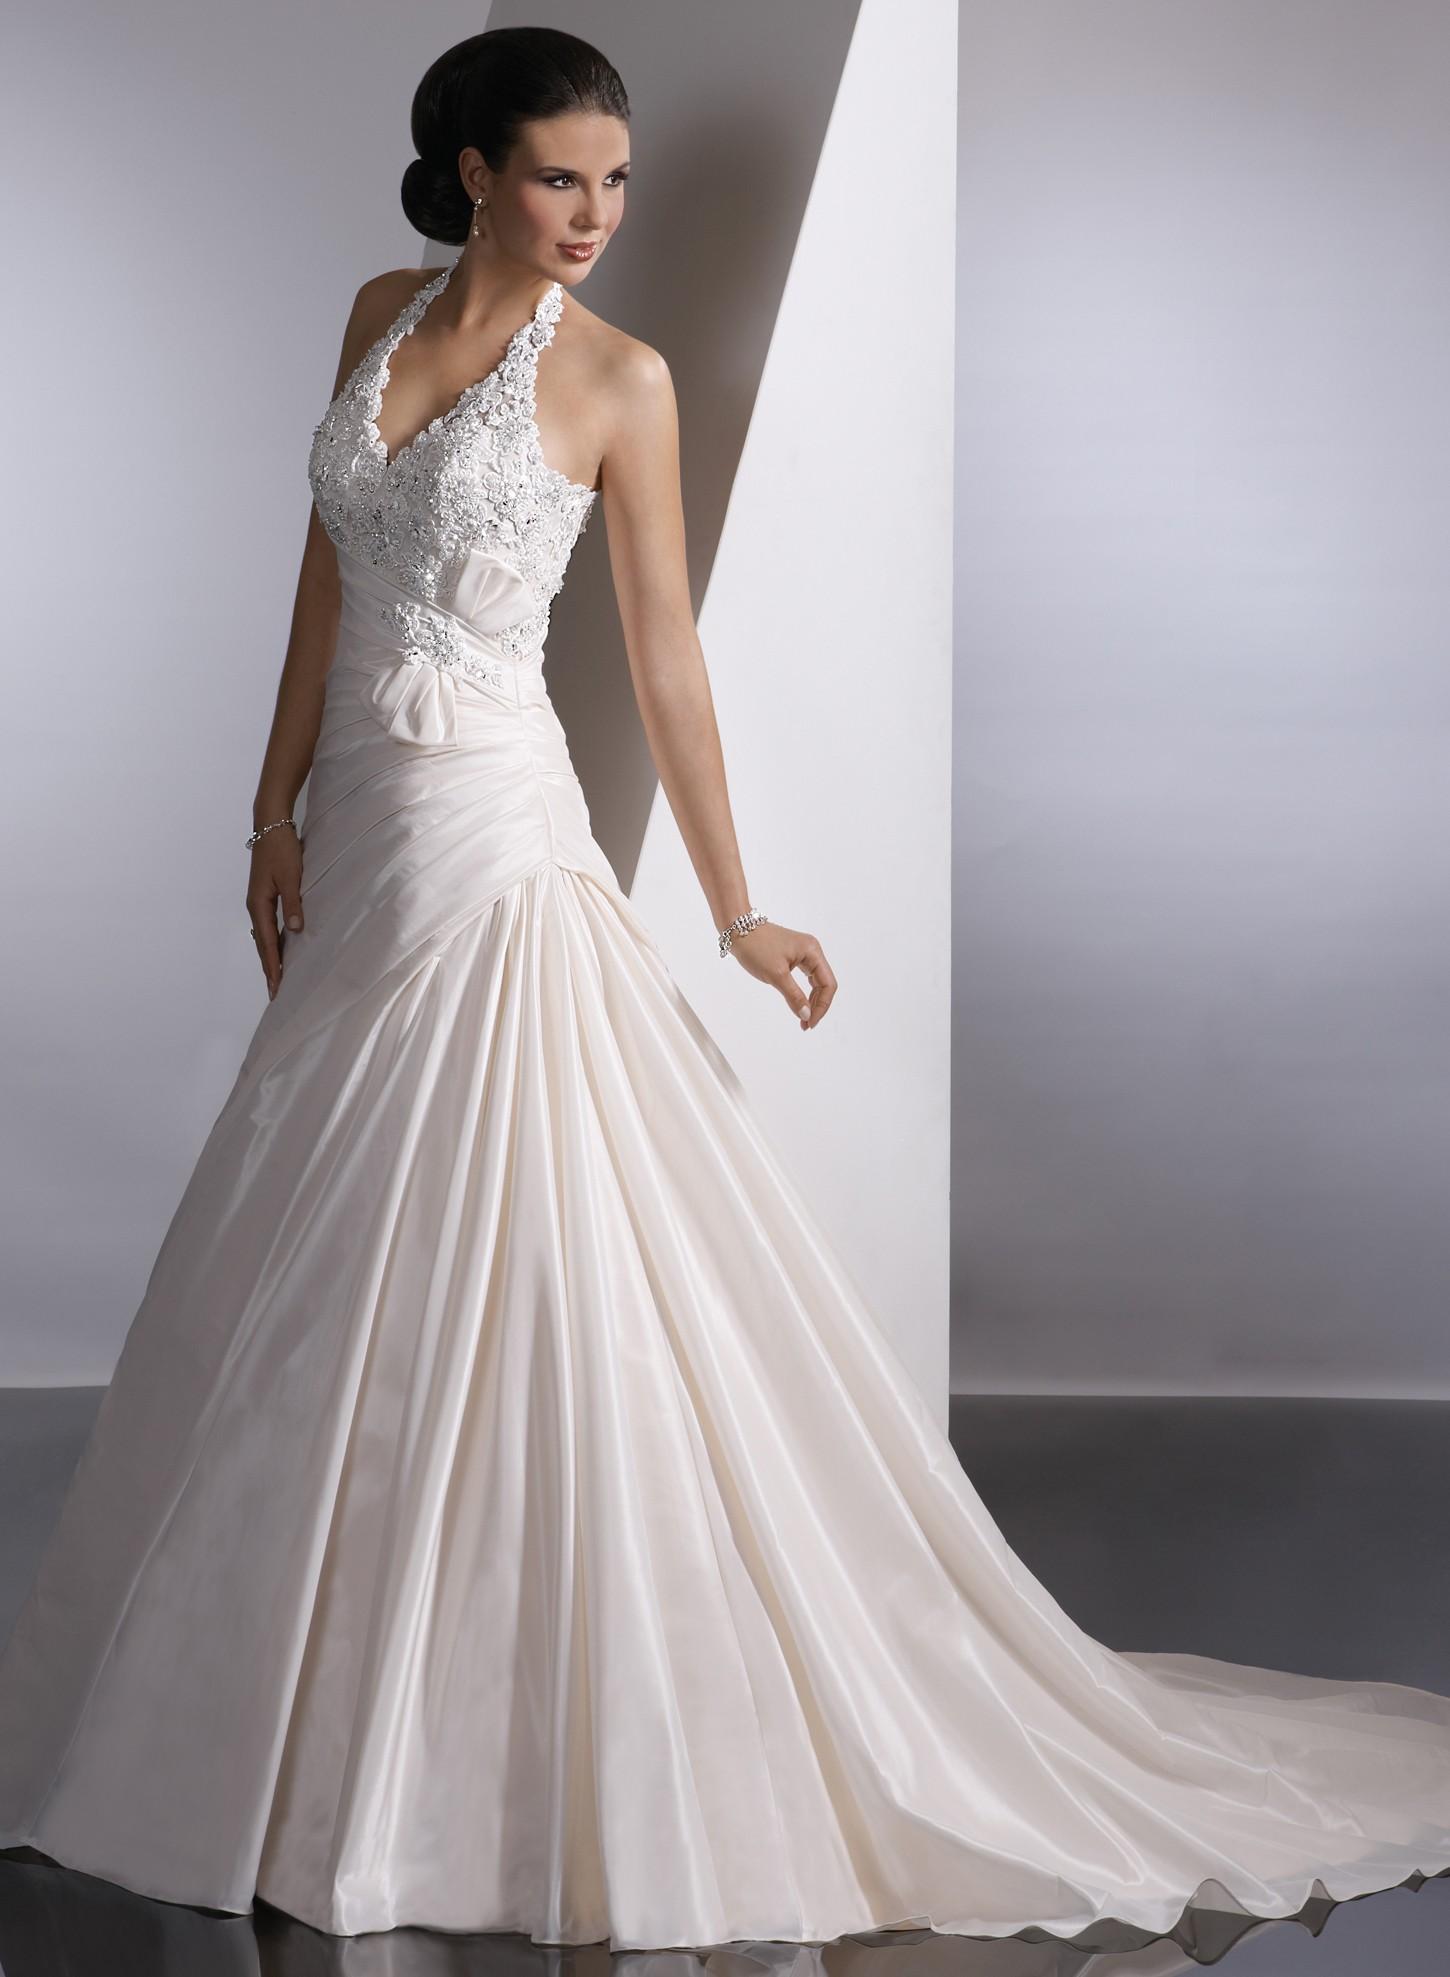 halter top beach wedding dresses photo - 1